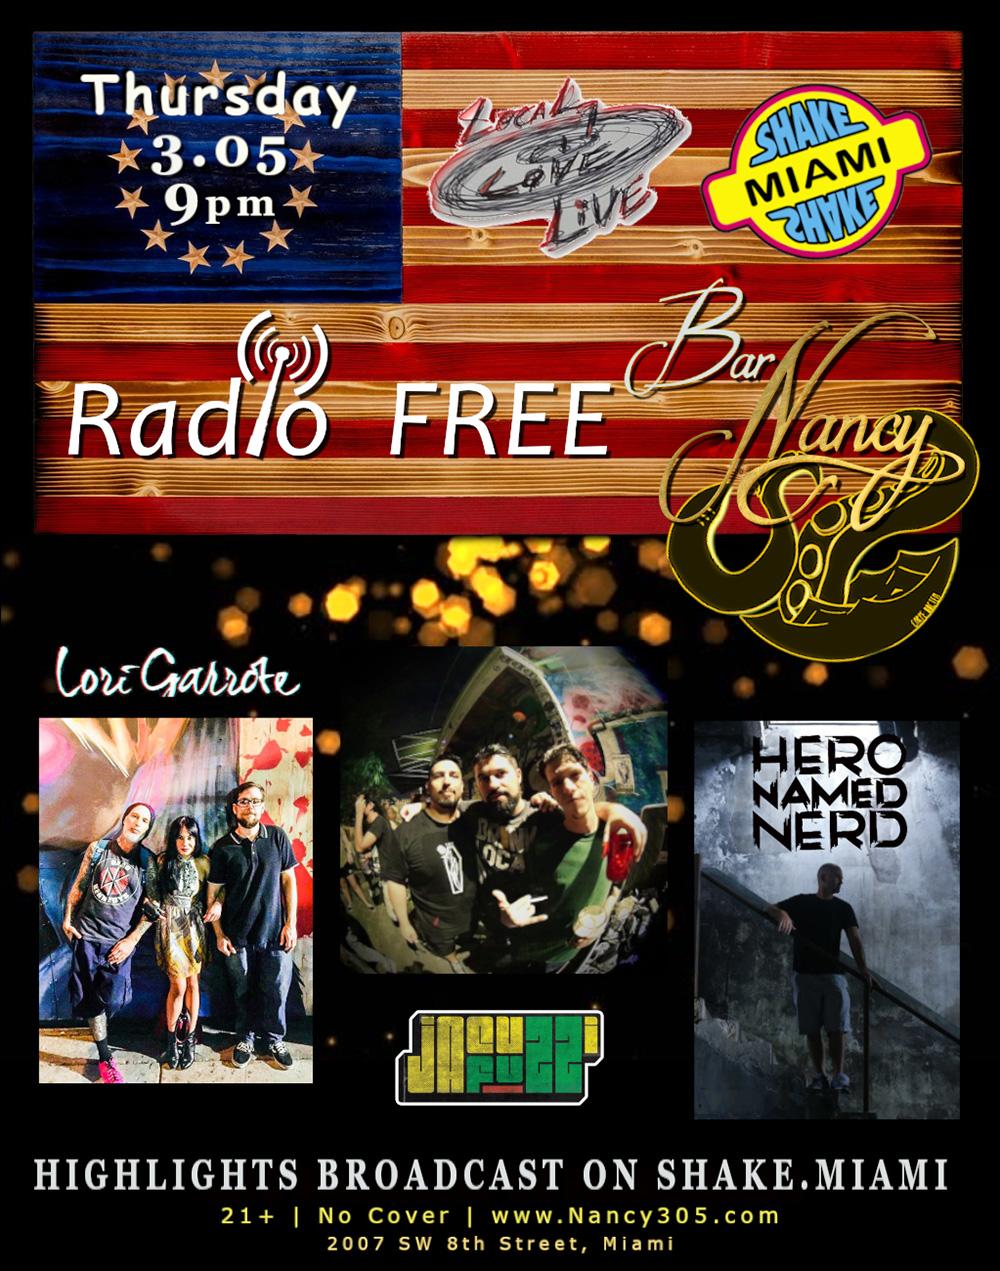 Radio Free Nancy! Presented by Local. Love. Live & Shake Miami!